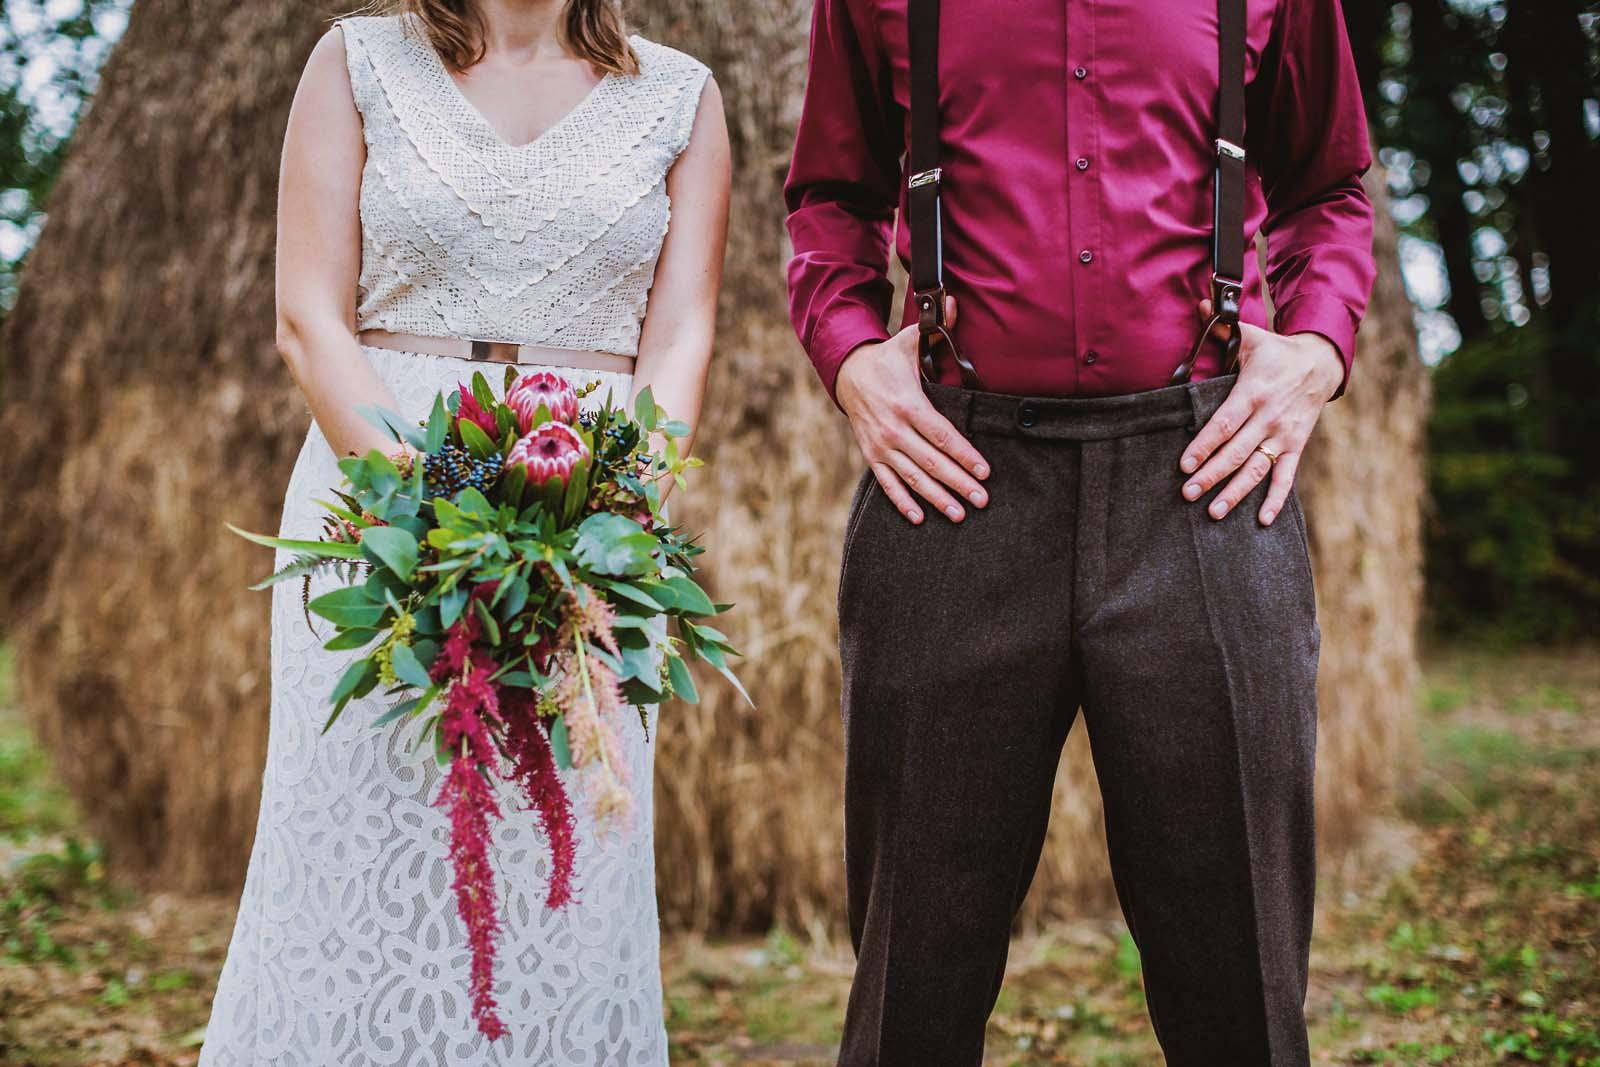 Hochzeitsfotograf Spreewald Brautpaar Copyright by Hochzeitsfotograf www.berliner-hochzeitsfotografie.de